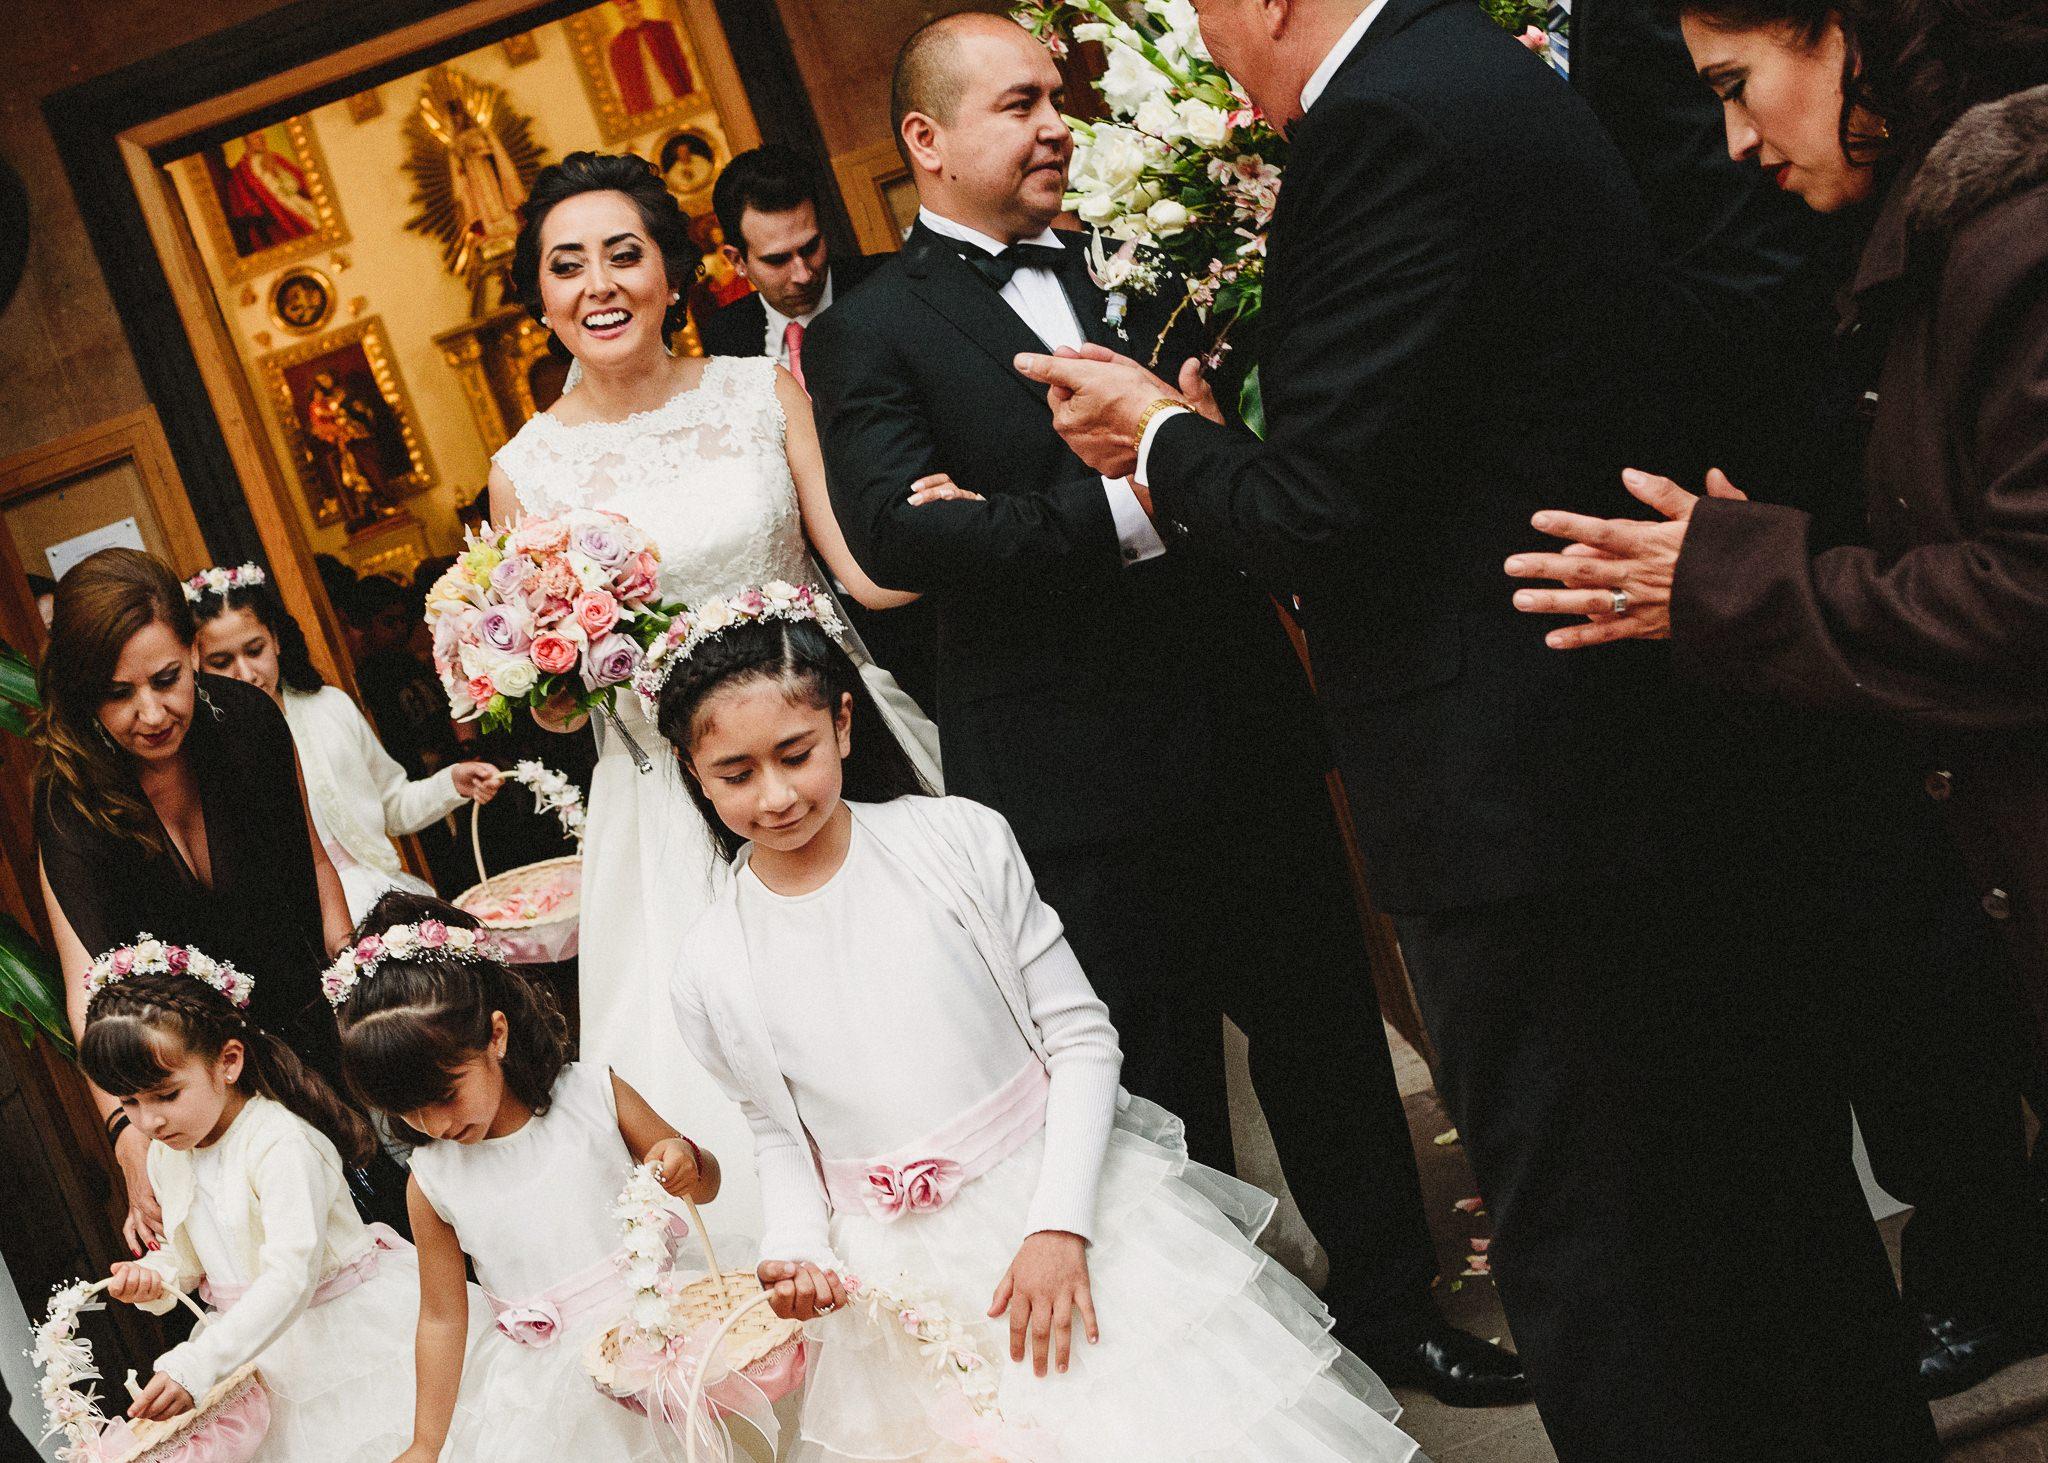 Wedding-Boda-Tulancingo-Hidalgo-Salon-Essenzia-Luis-Houdin-33-film